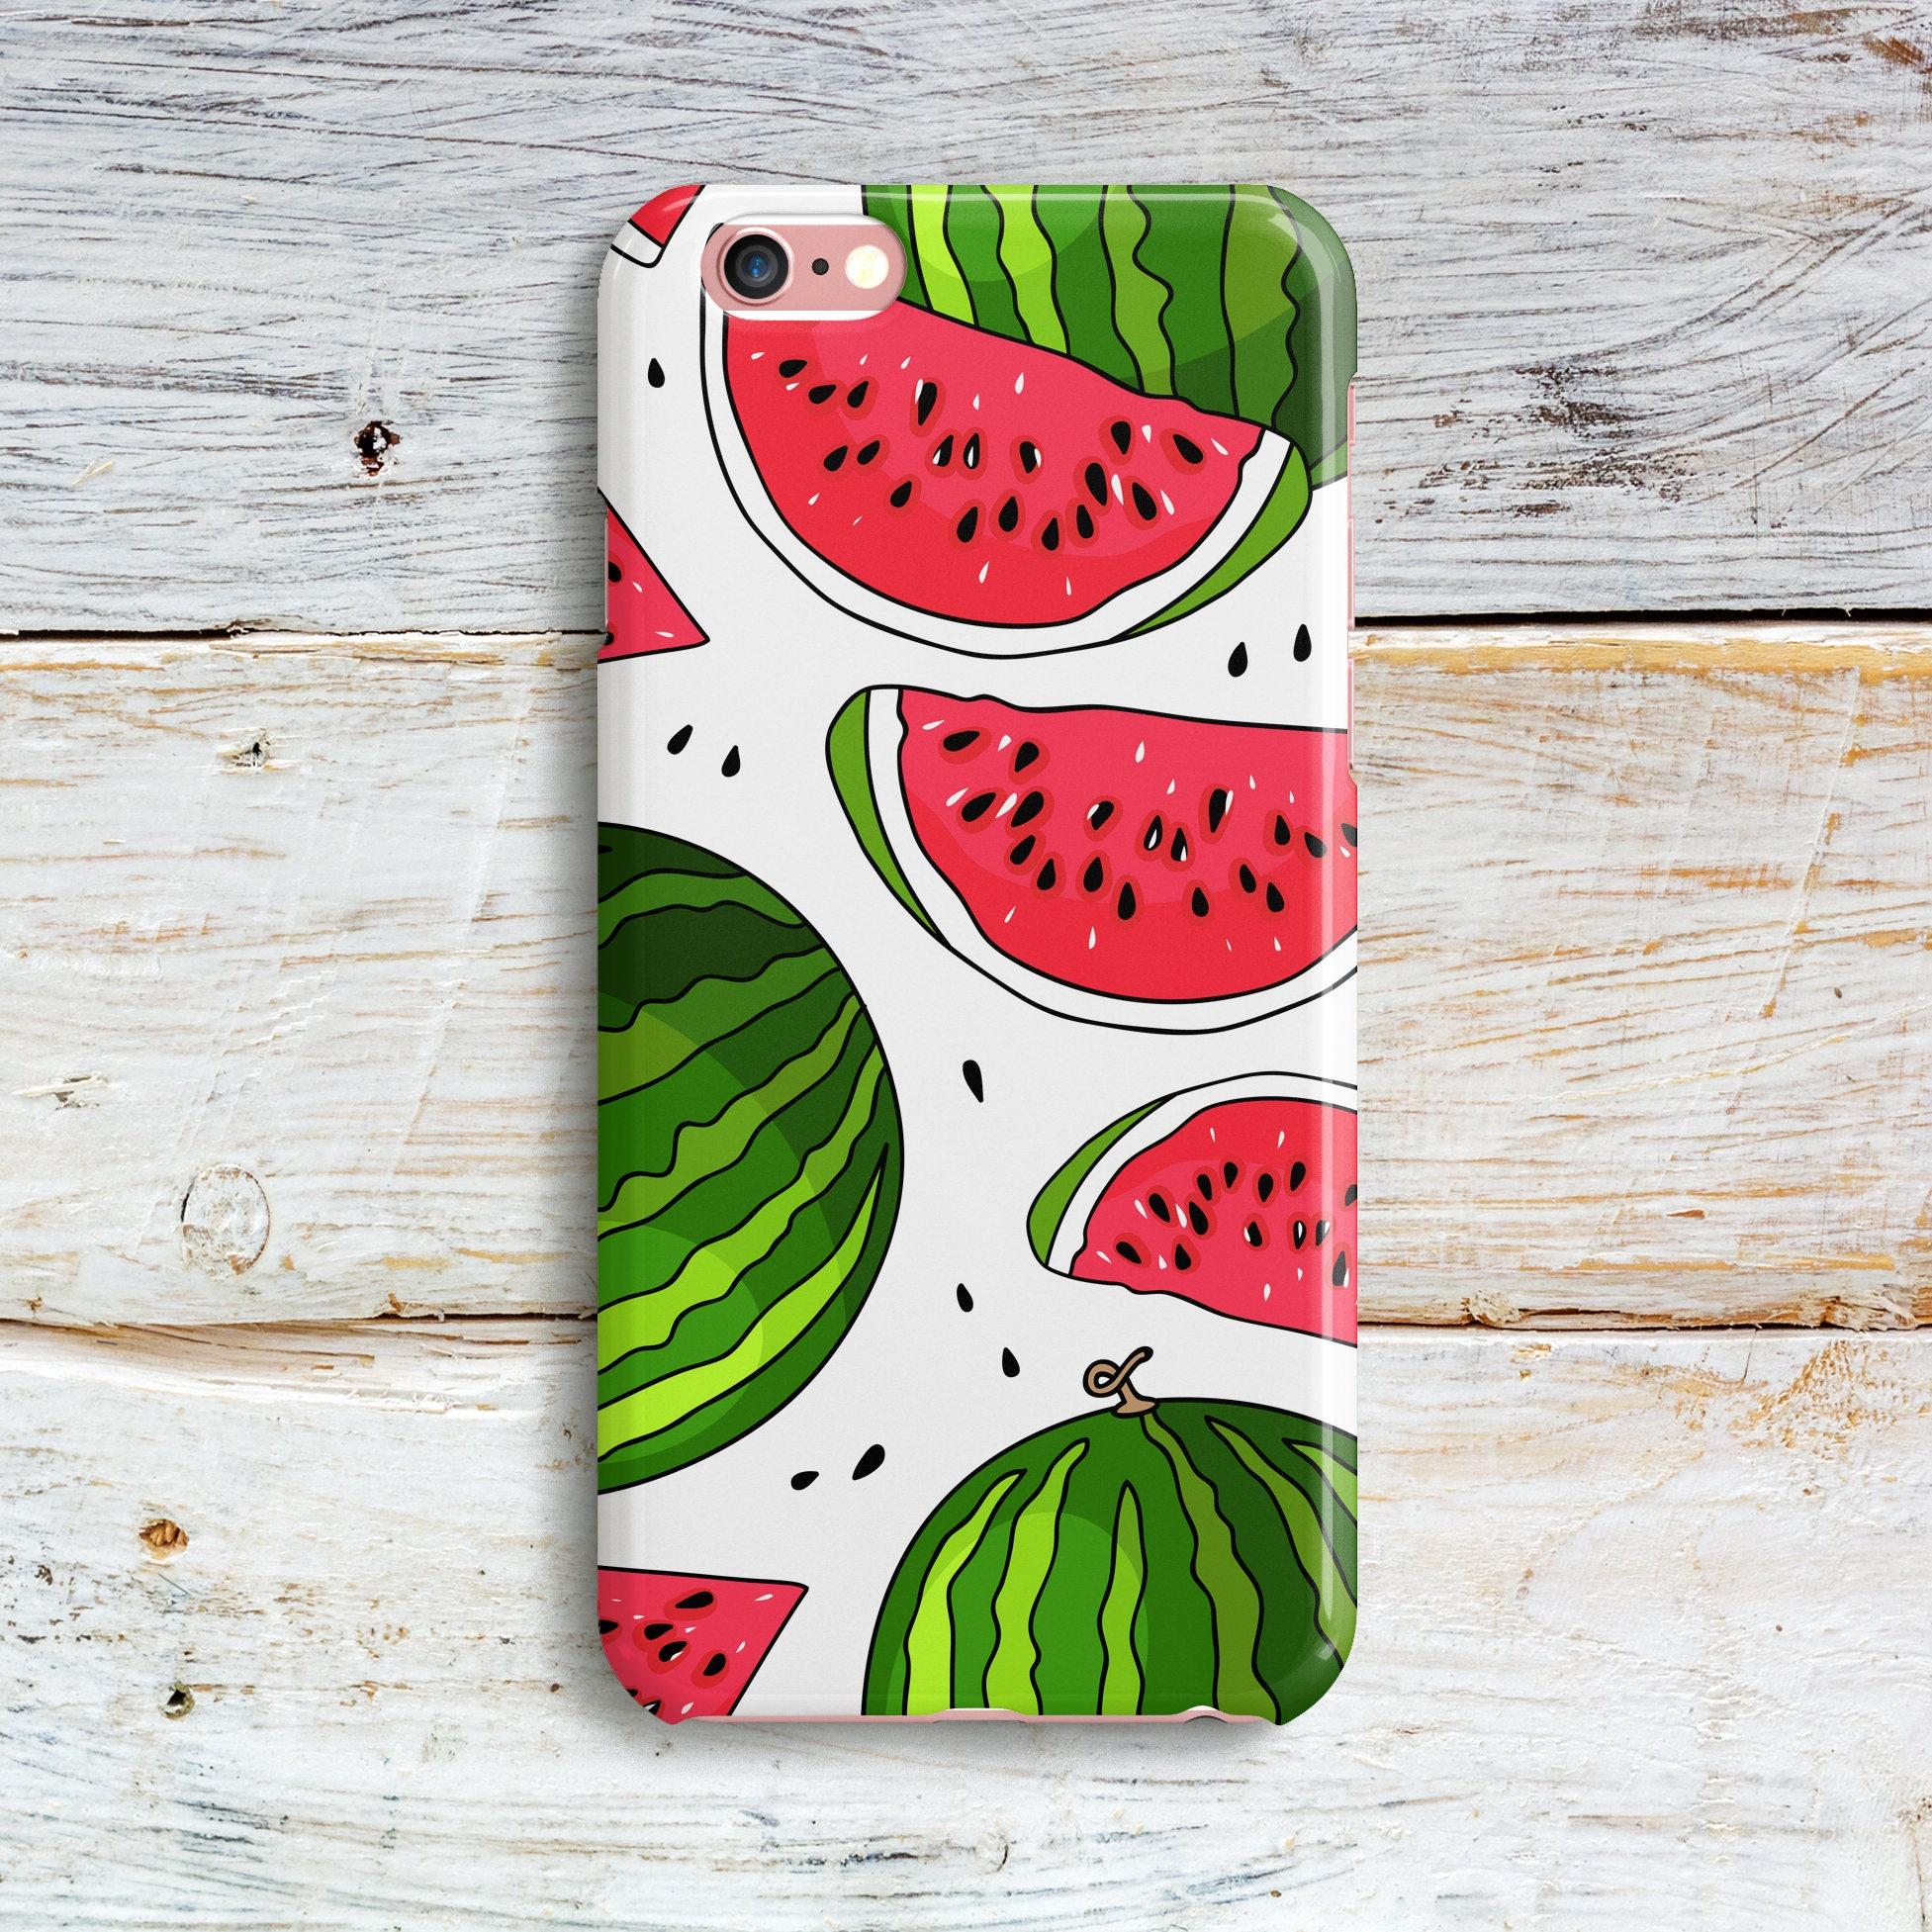 Phone Cases Custom Hardcase Midnight Dots Iphone 4 5 5c 6 Plus 7 Case 8 Cover Fruits Se 5s